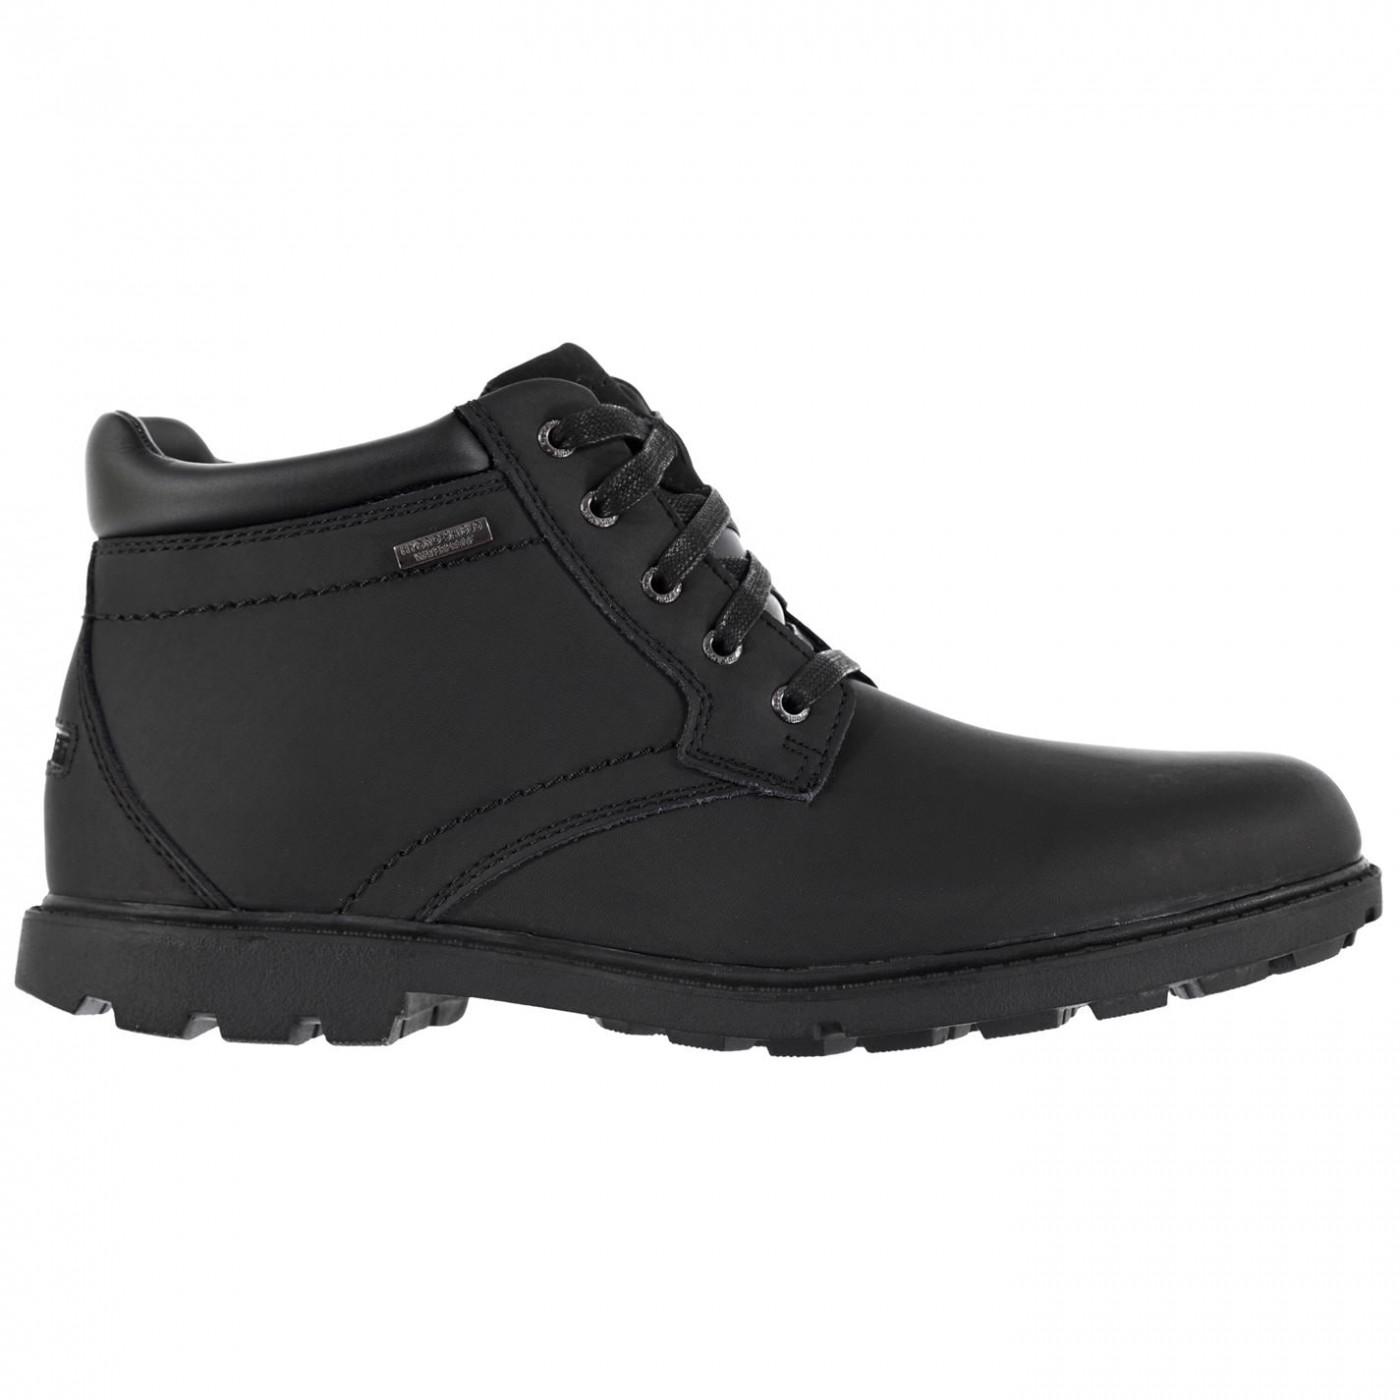 Rockport Toe Boot Sn01